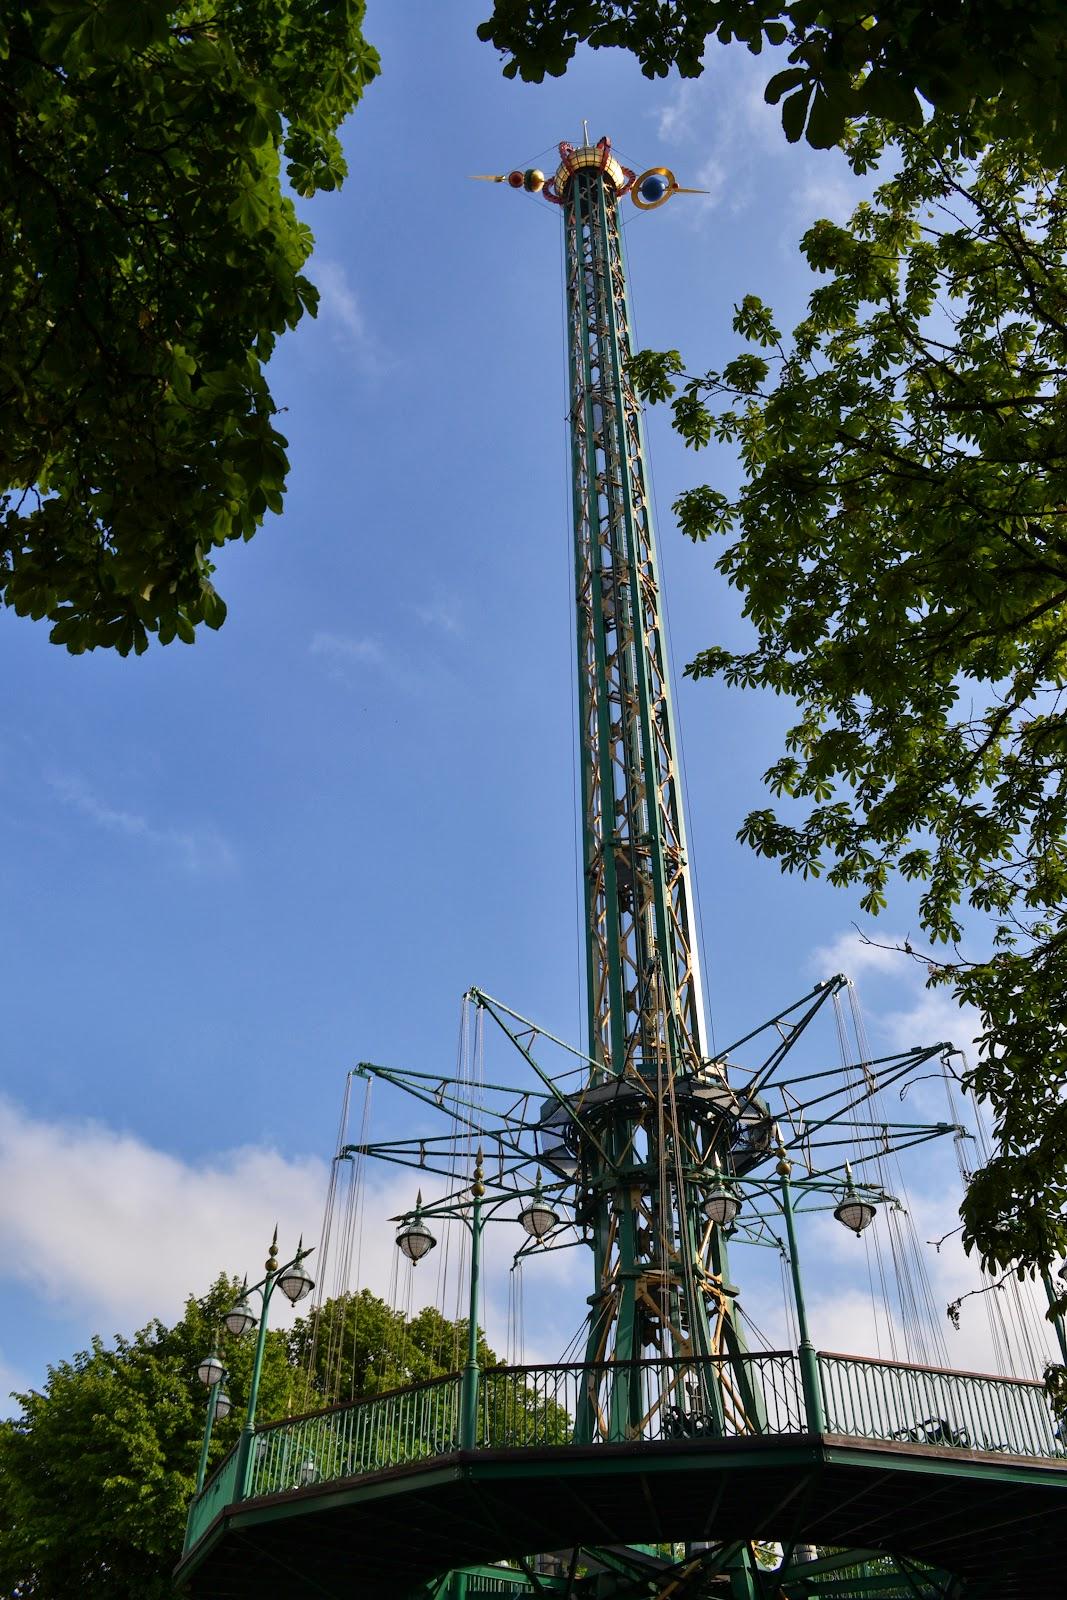 The Dragon - giant swing in trivoli garden copenhagen